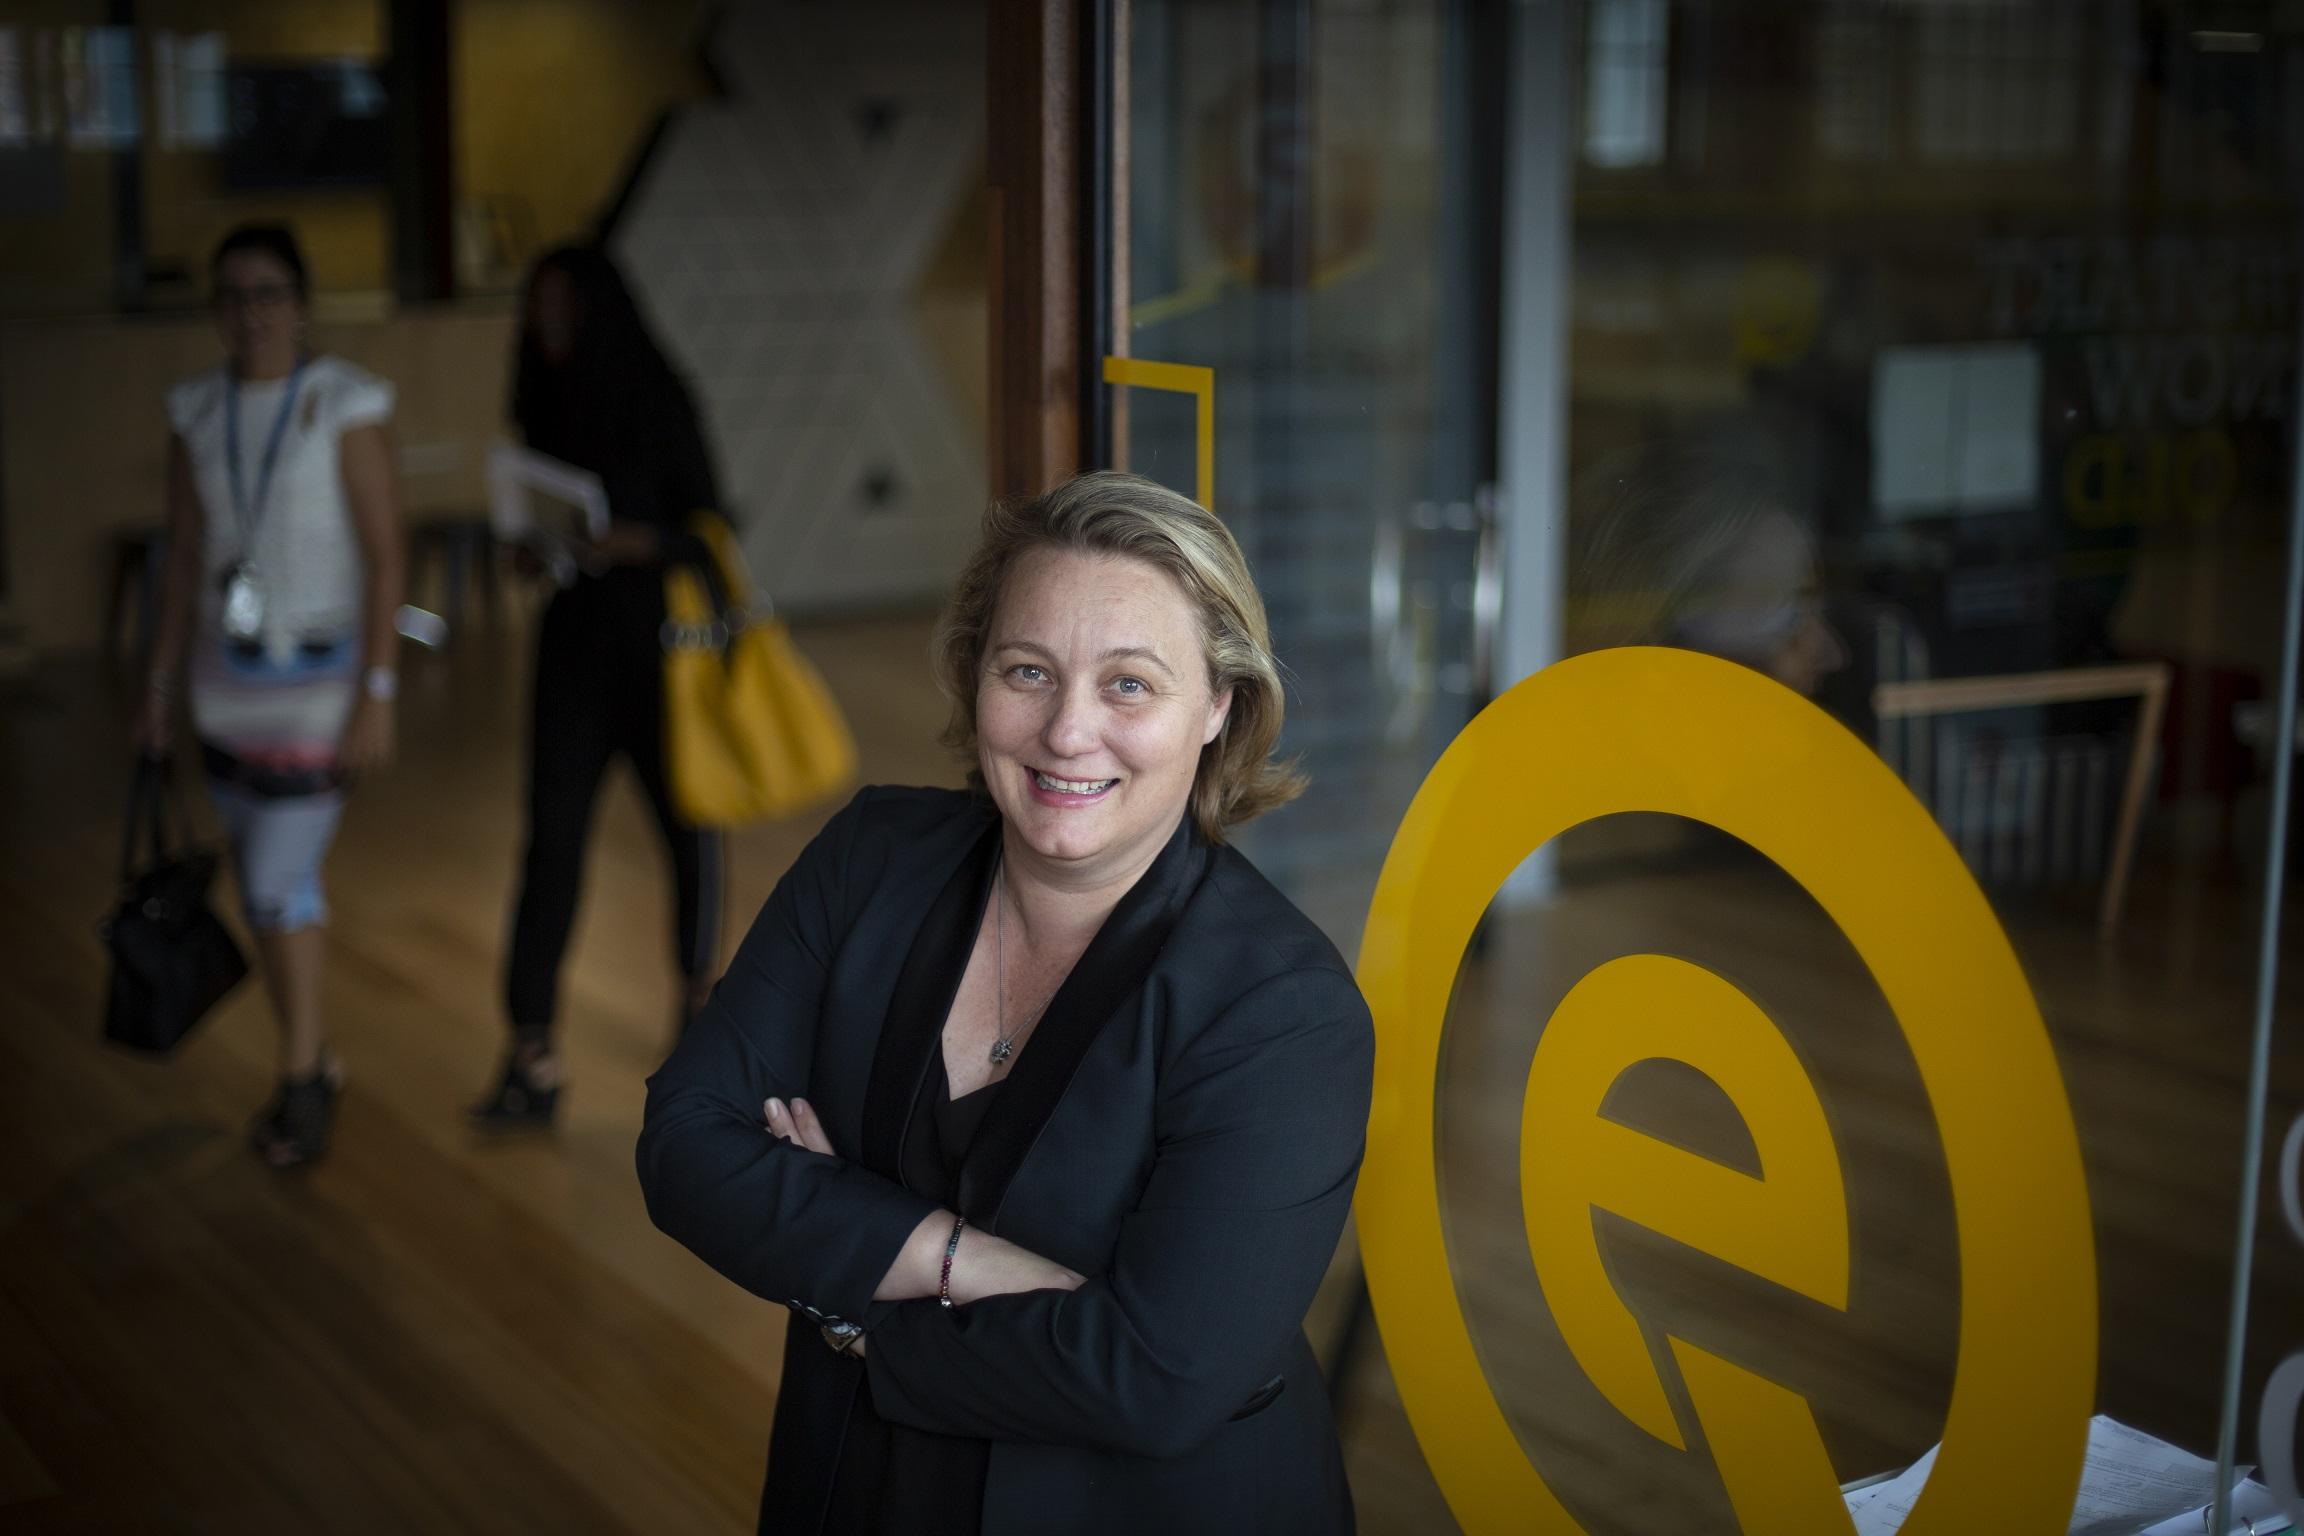 Business Moreton Bay Region Events presents Leanne Kemp